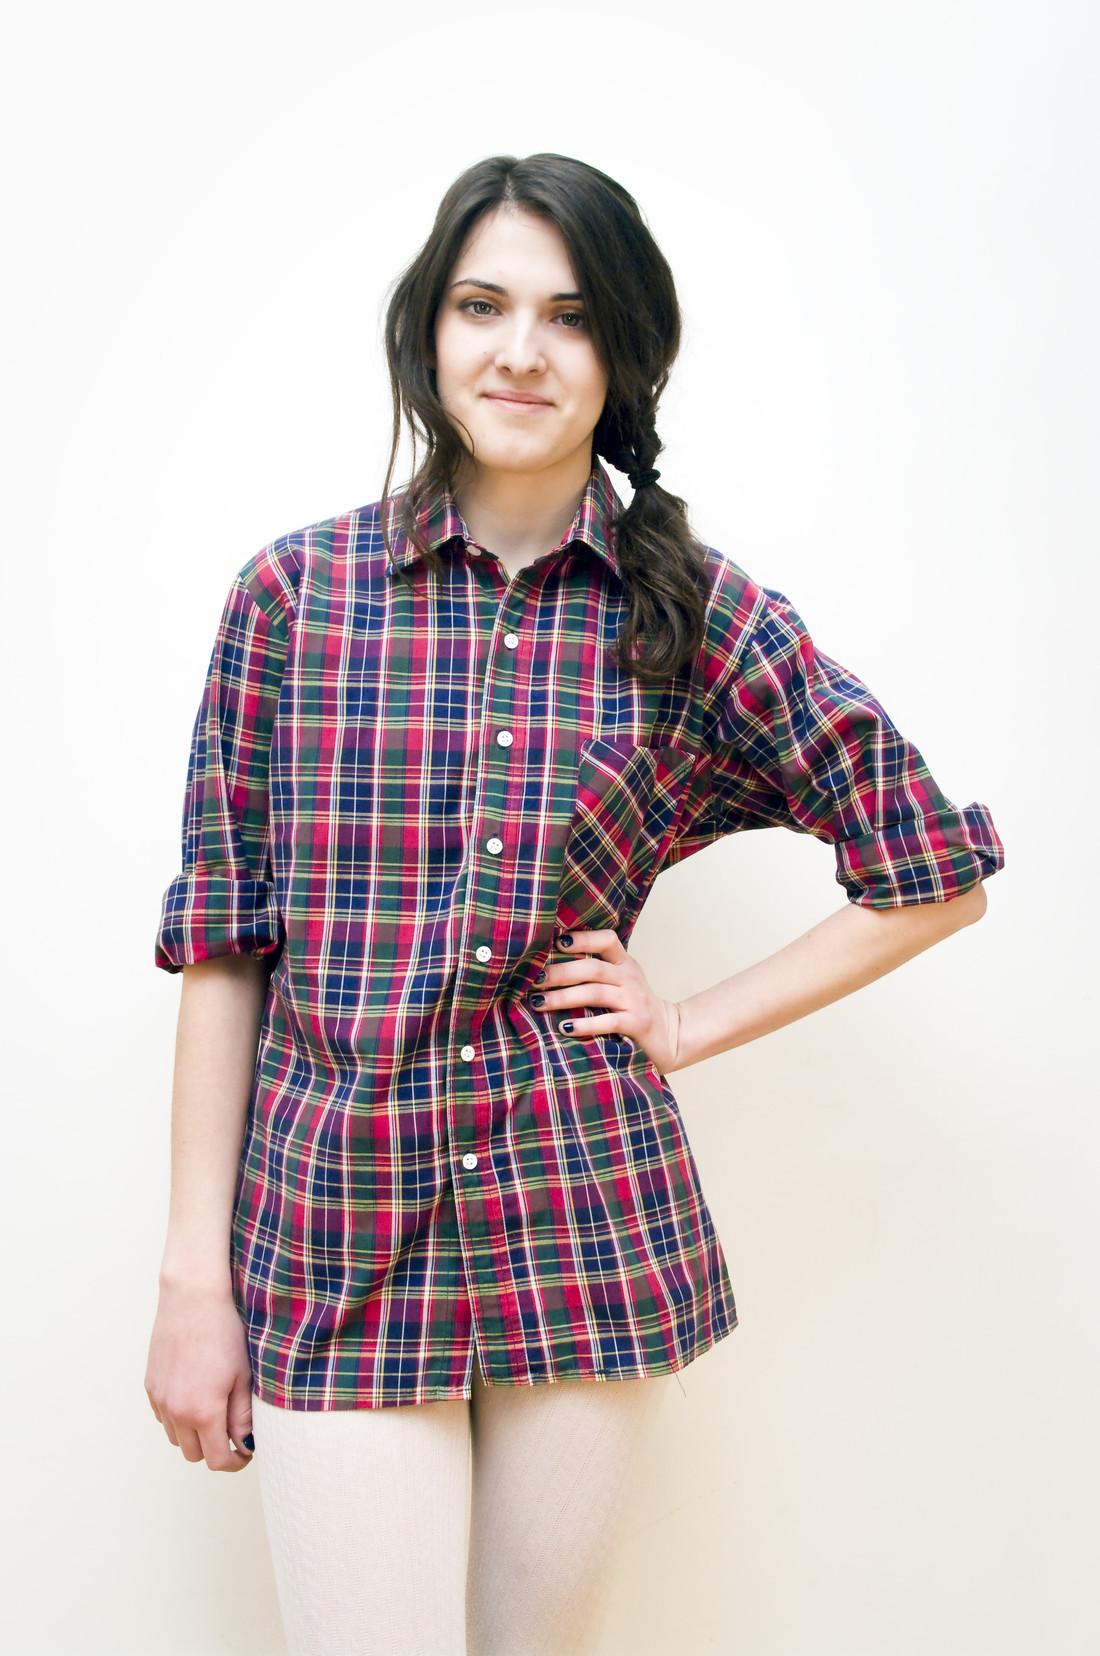 Plaid shirt - Pop Sick Vintage